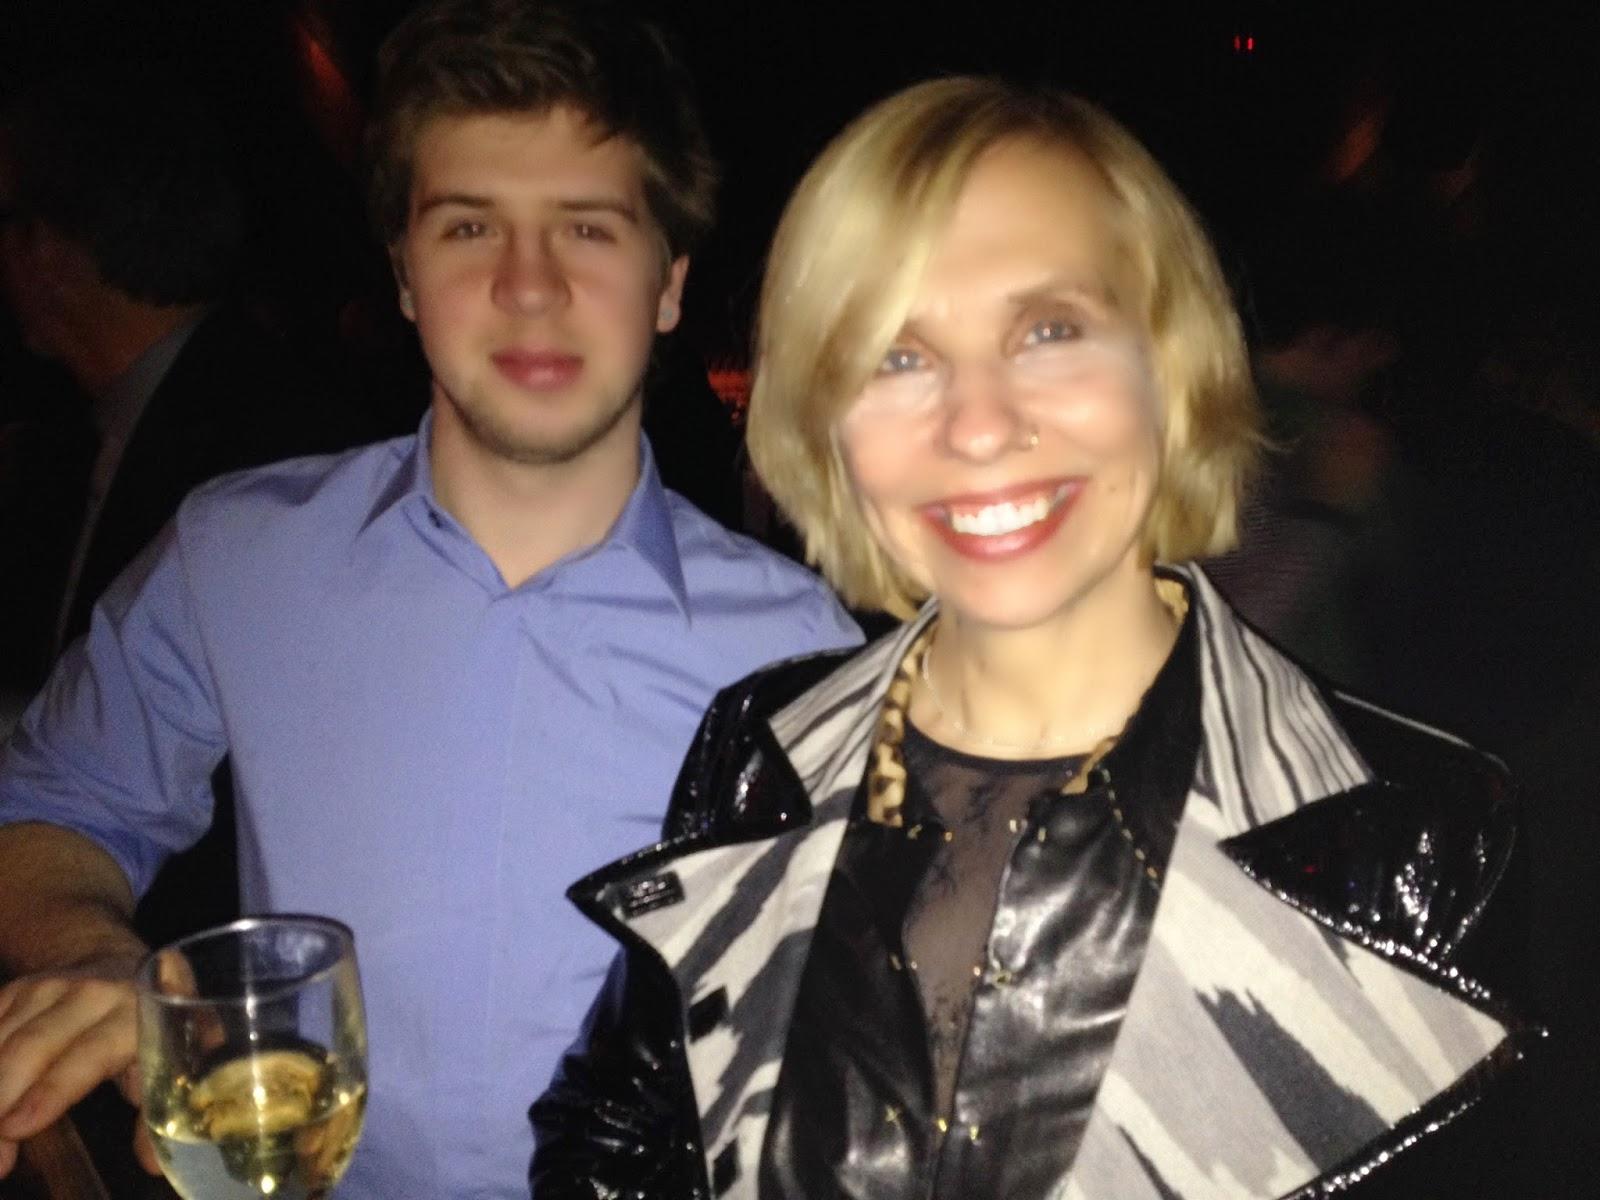 Kahil's partner Lucy Slvinski and her son